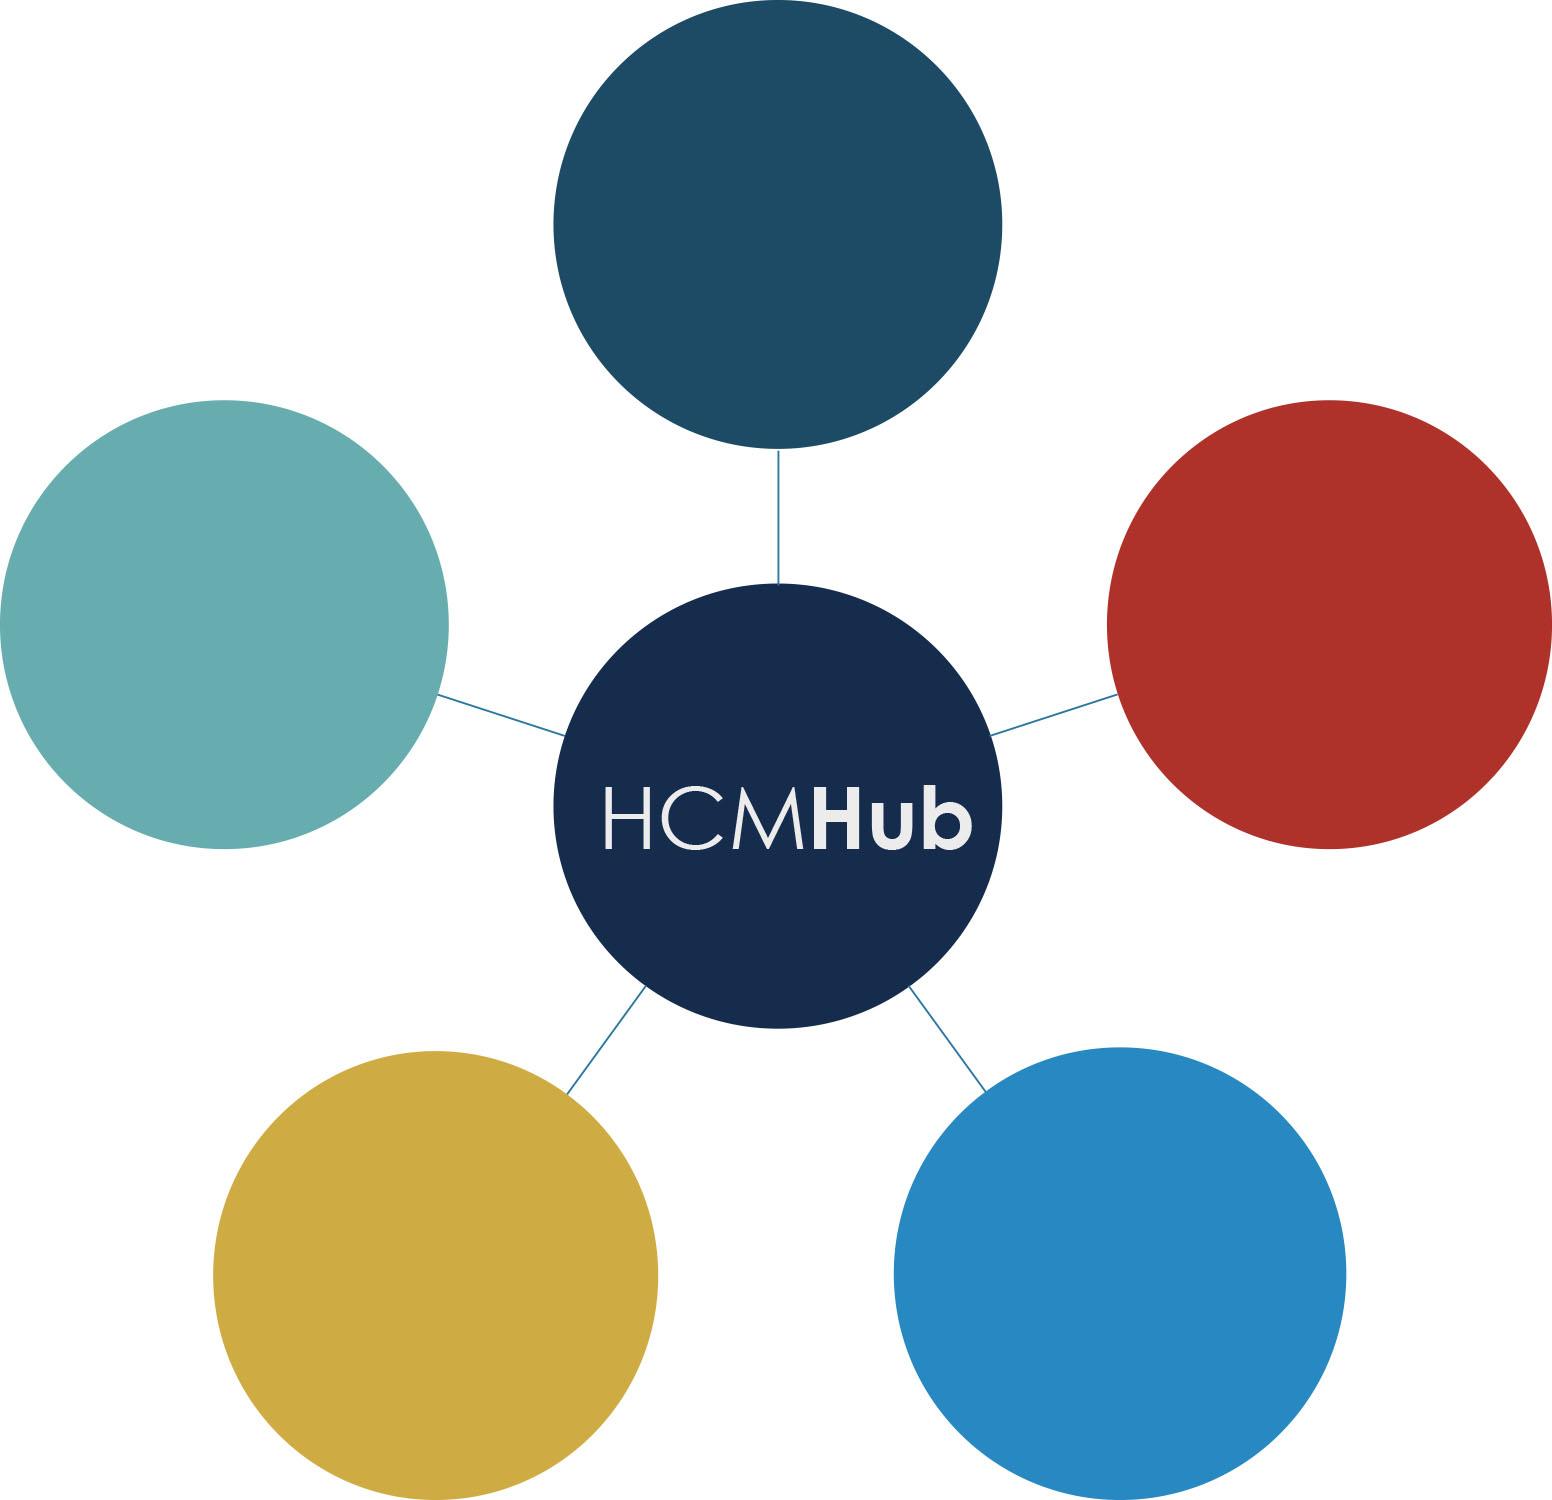 HCMHubLink